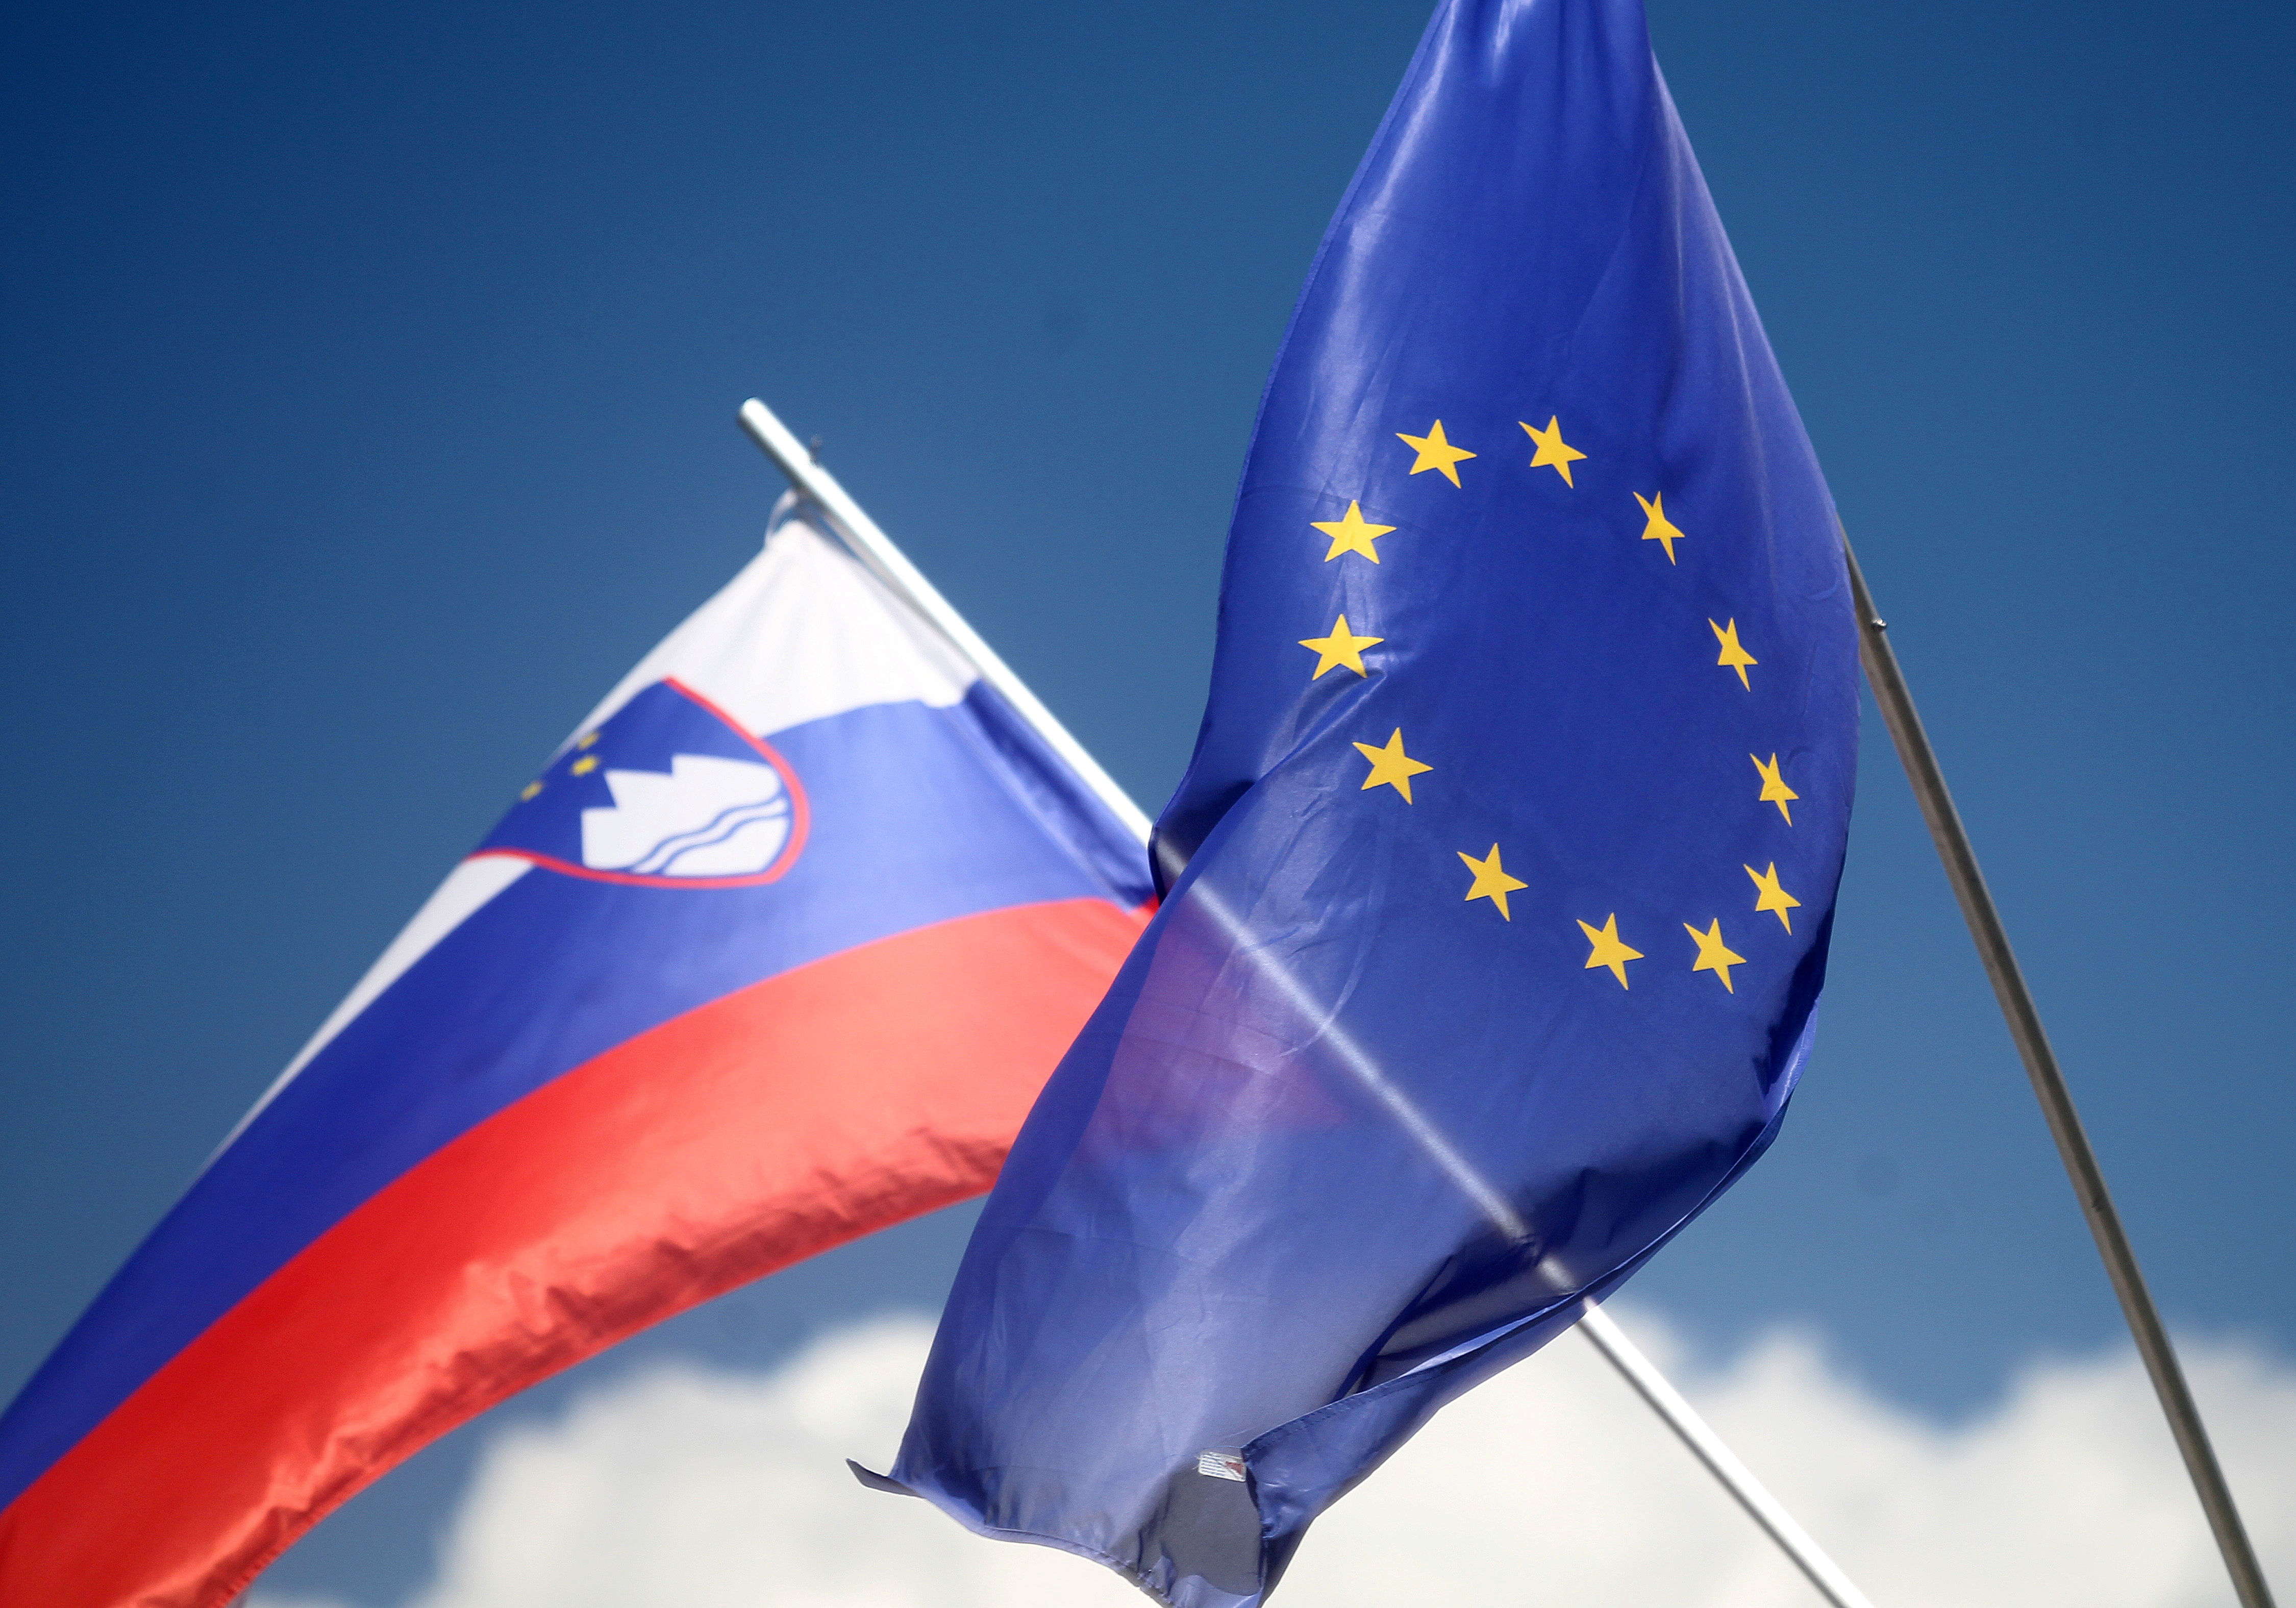 The European and Slovenian flags flutter ahead of the start of Slovenia's EU presidency in Medvode, Slovenia June 30, 2021. REUTERS/Srdjan Zivulovic/File Photo